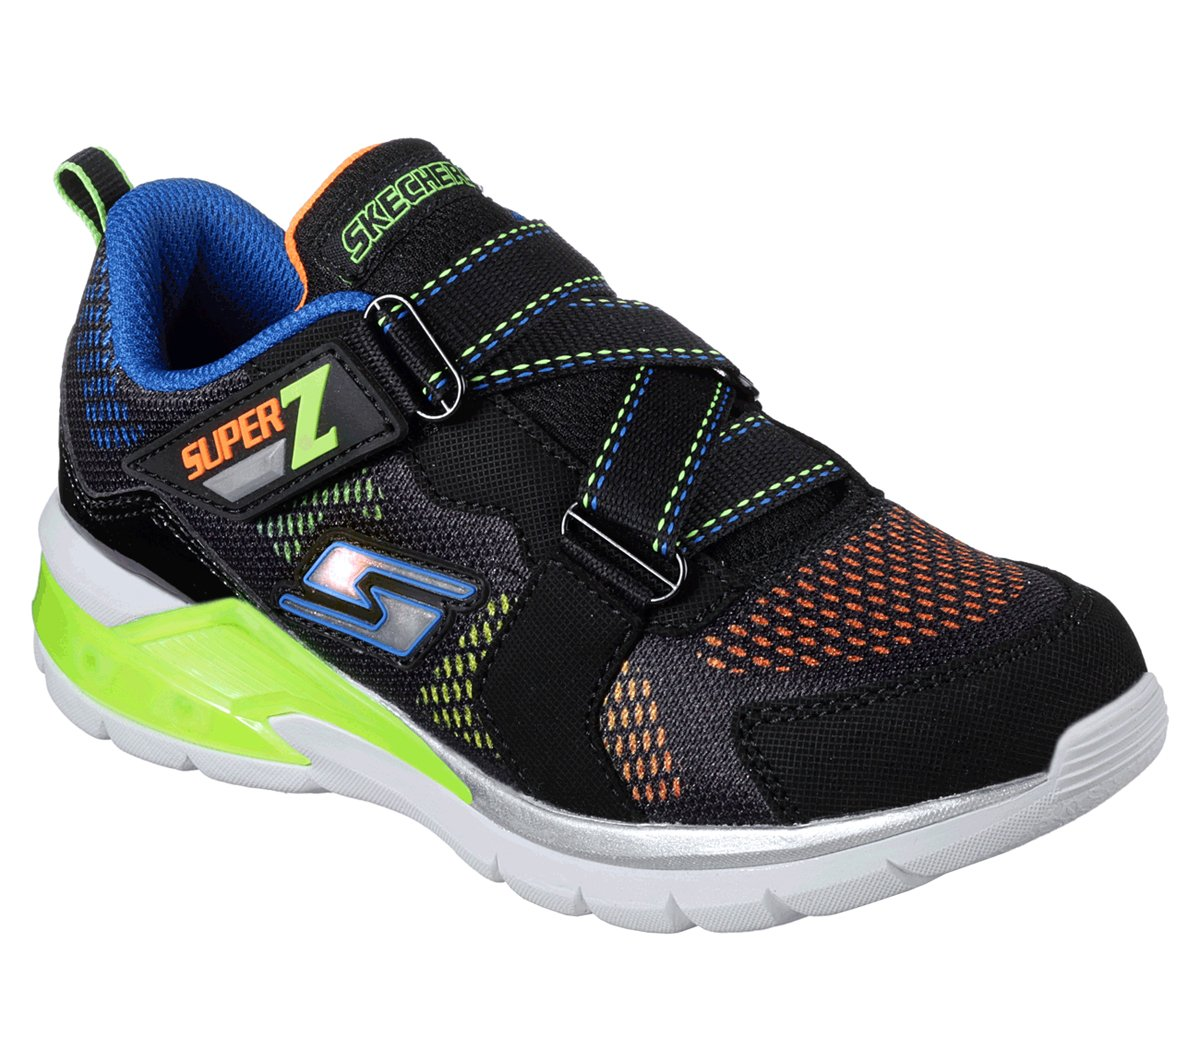 Skechers 90552N Kids' S Light: Erupters II Sneaker, Black/Lime - 9